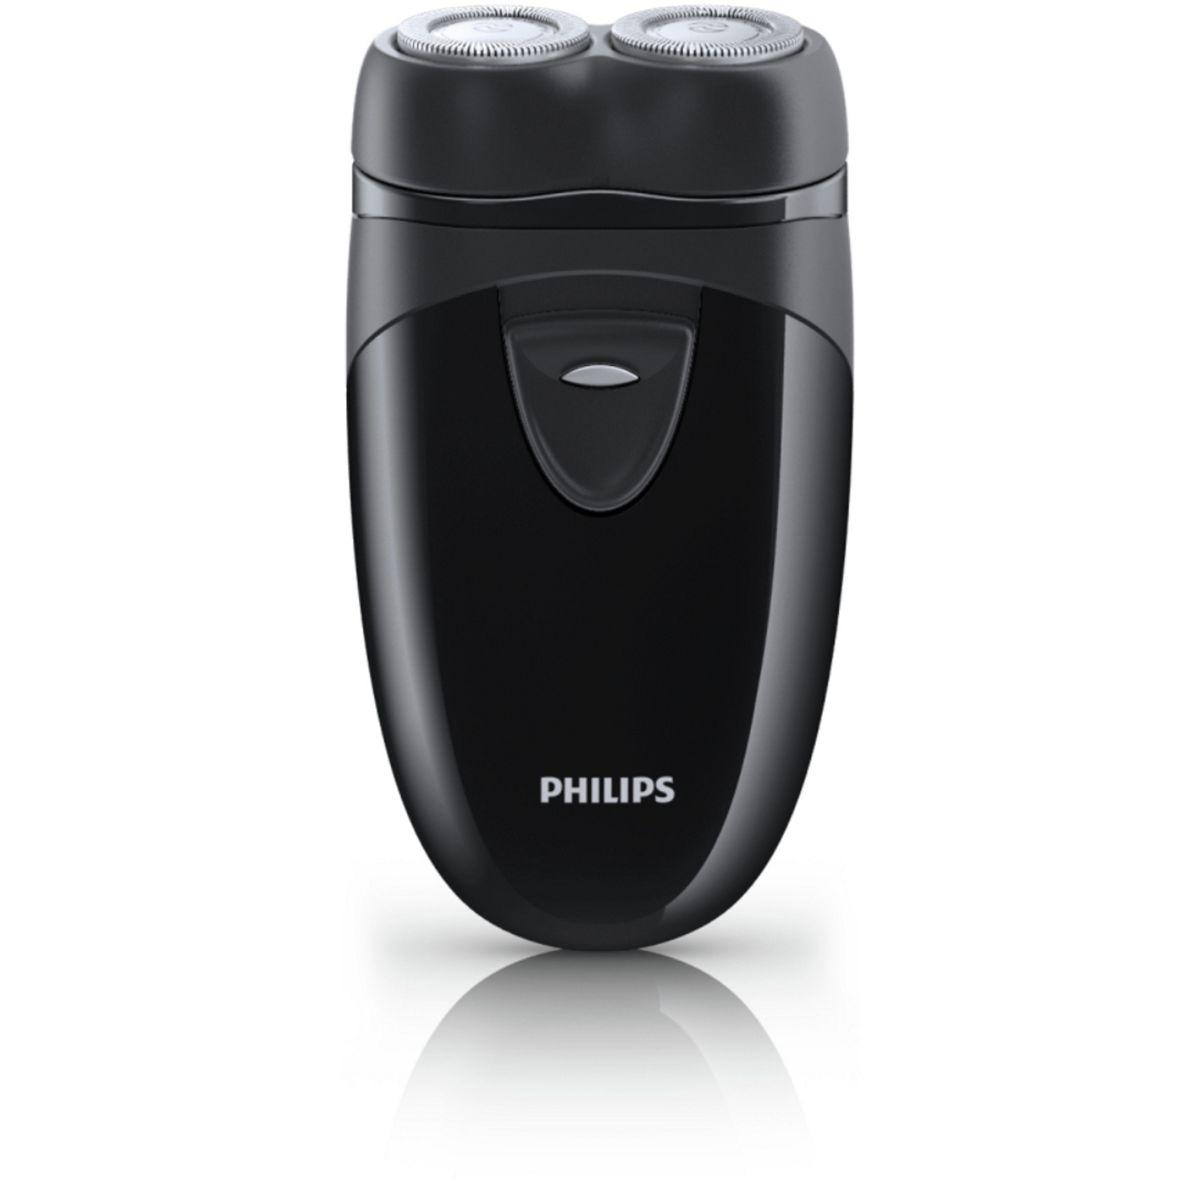 Philips Pq203 Cordless Plus Travel Electric Shaver Black